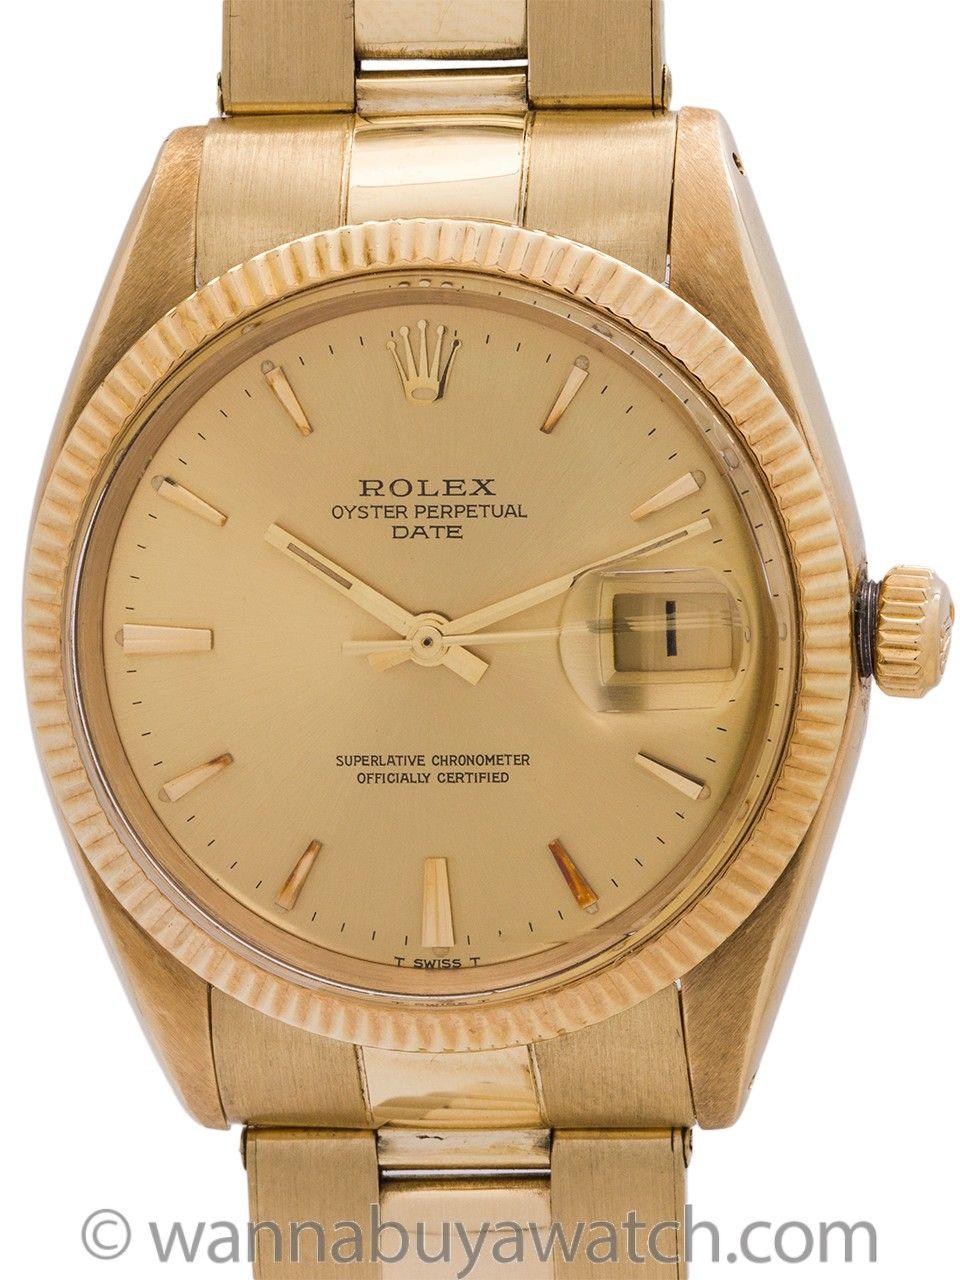 Rolex Oyster Perpetual Date Ref 1500 14k Yg Circa 1966 Rolex Oyster Perpetual Date Oyster Perpetual Rolex